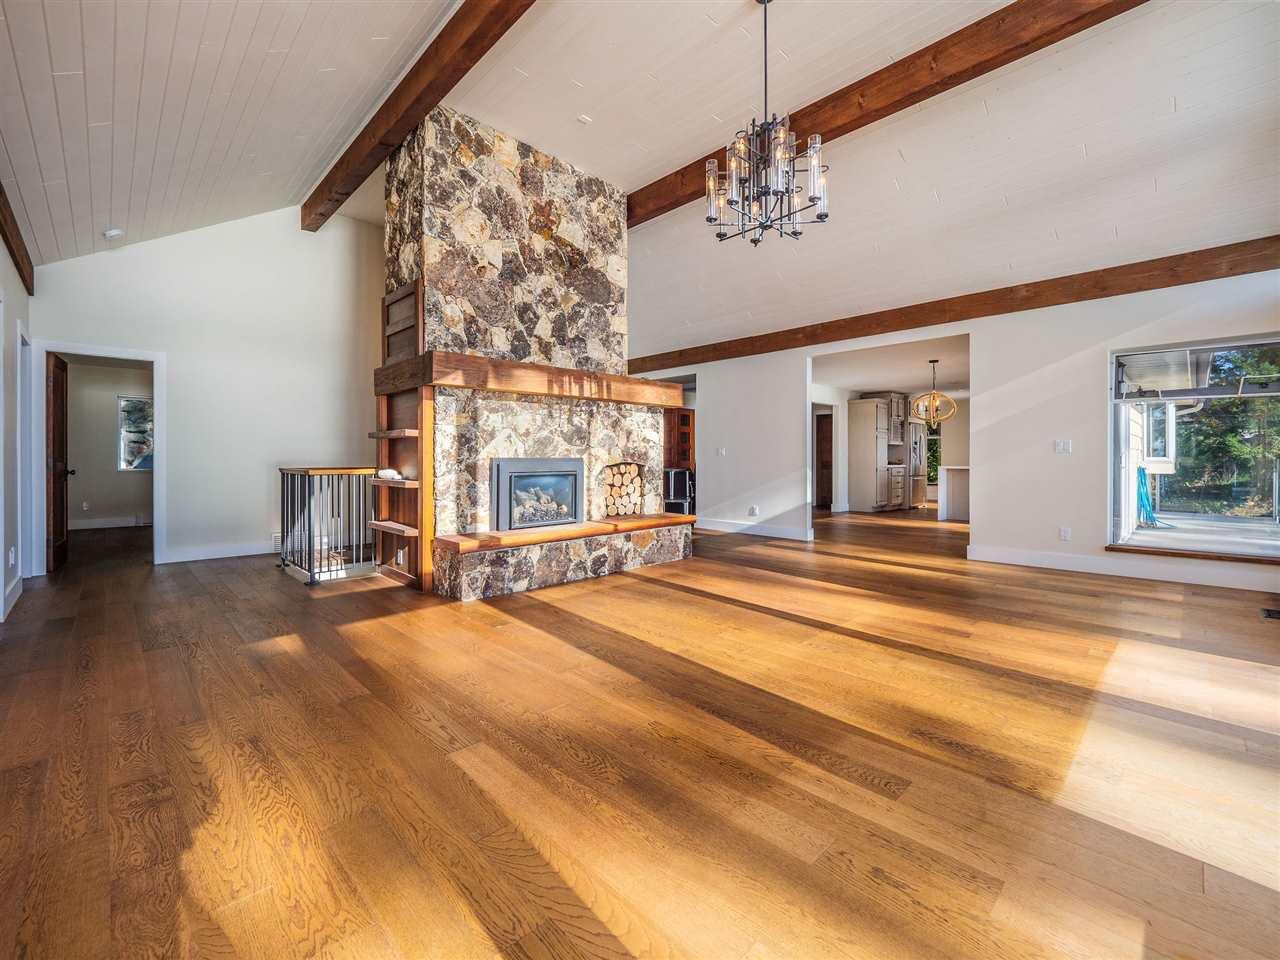 "Photo 16: Photos: 7101 DALE Road in Sechelt: Sechelt District House for sale in ""Caleda Estates"" (Sunshine Coast)  : MLS®# R2515160"